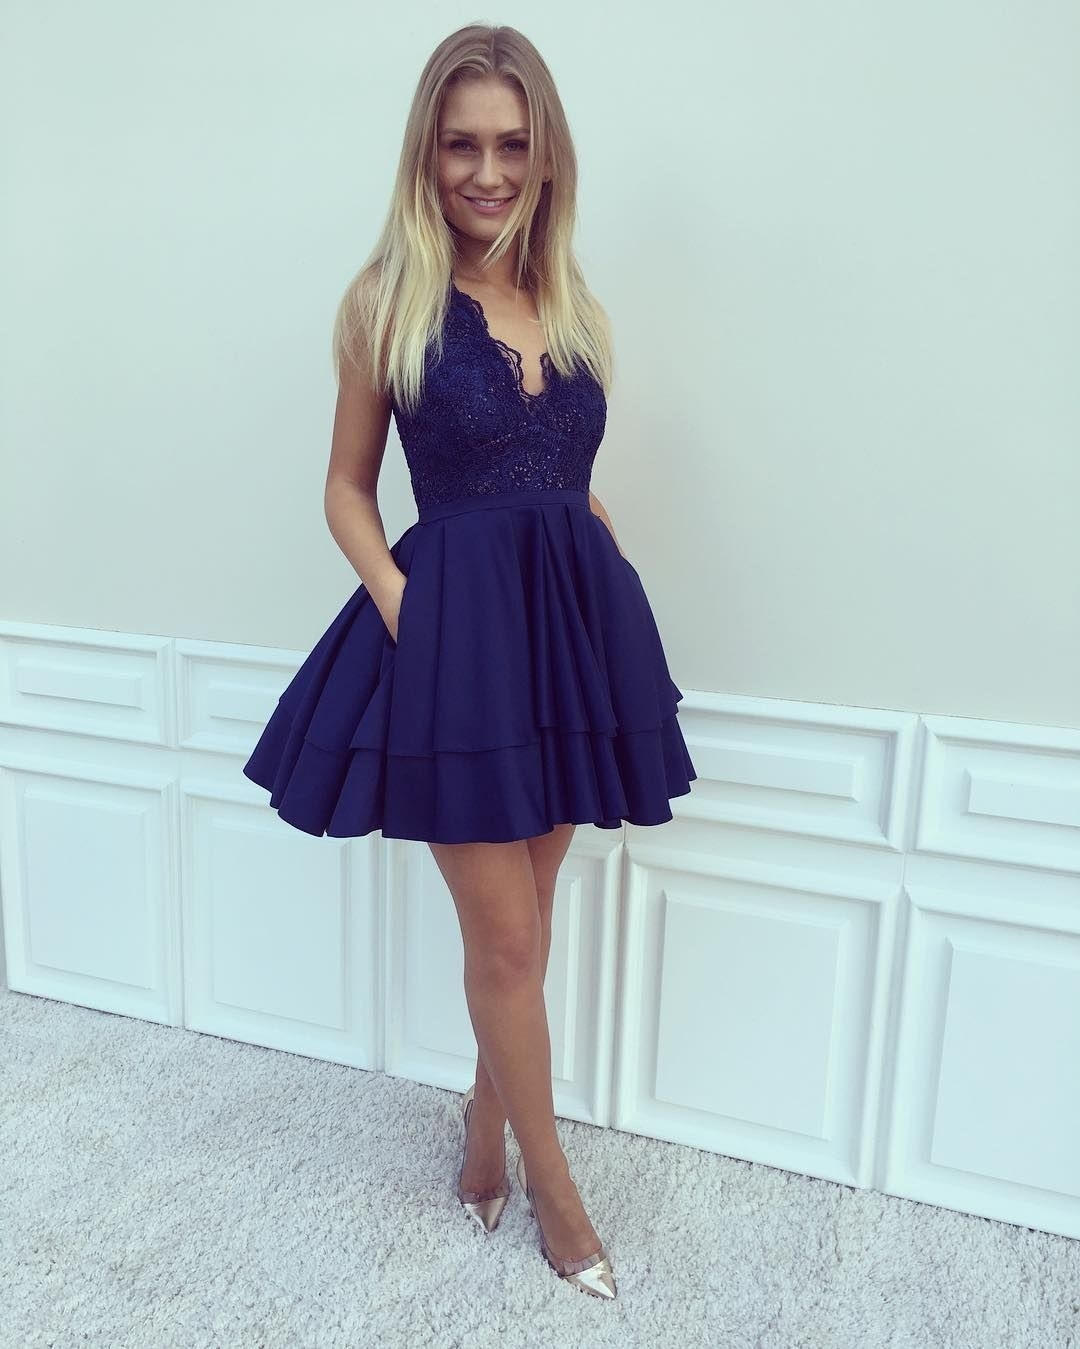 15 Spektakulär Kleid Kurz Blau Vertrieb15 Genial Kleid Kurz Blau Vertrieb